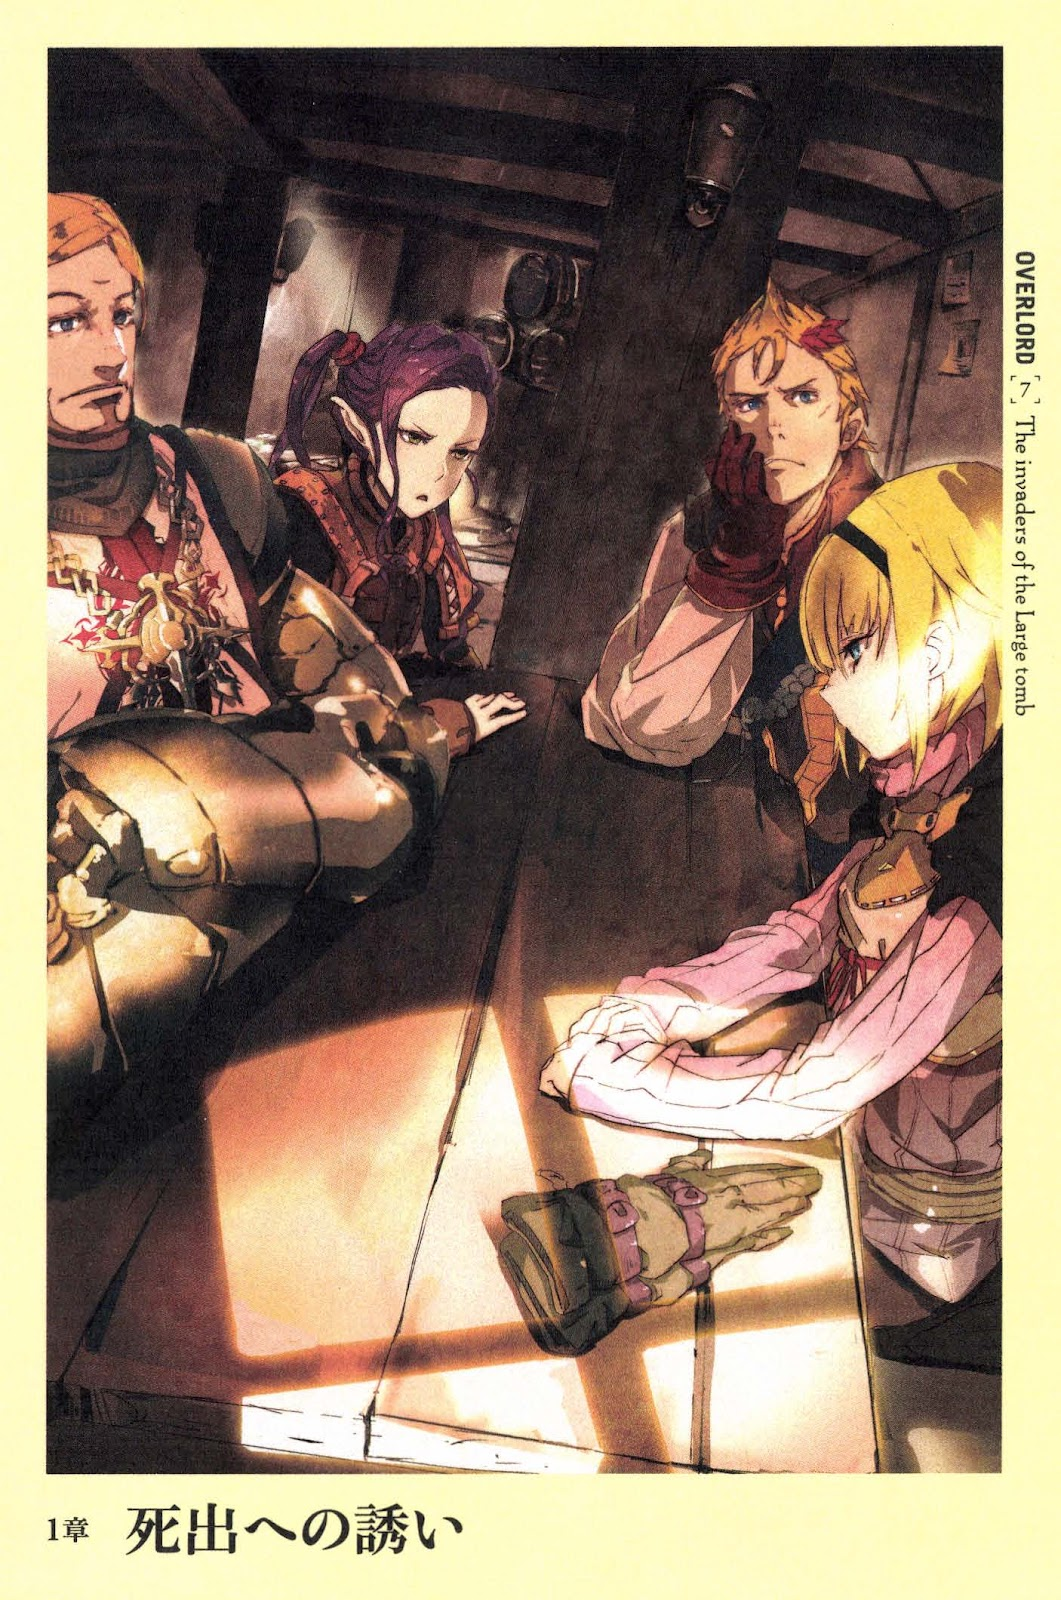 No Game Life Volume 7 Prologue | Wajigame co